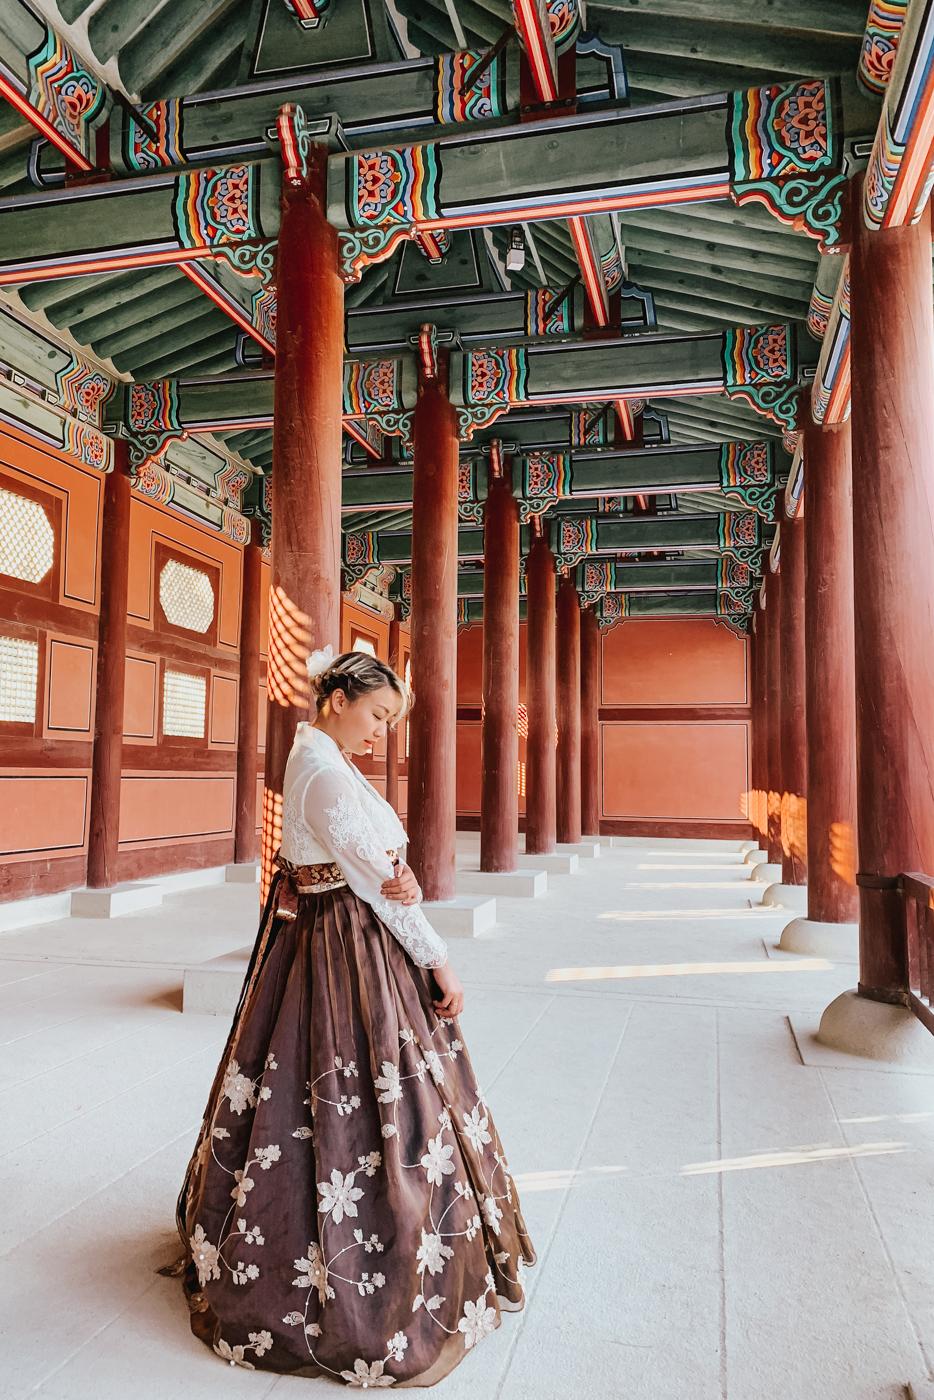 Gyeongbokgung | Seoul, Korea Travel Guide | The Chic Diary